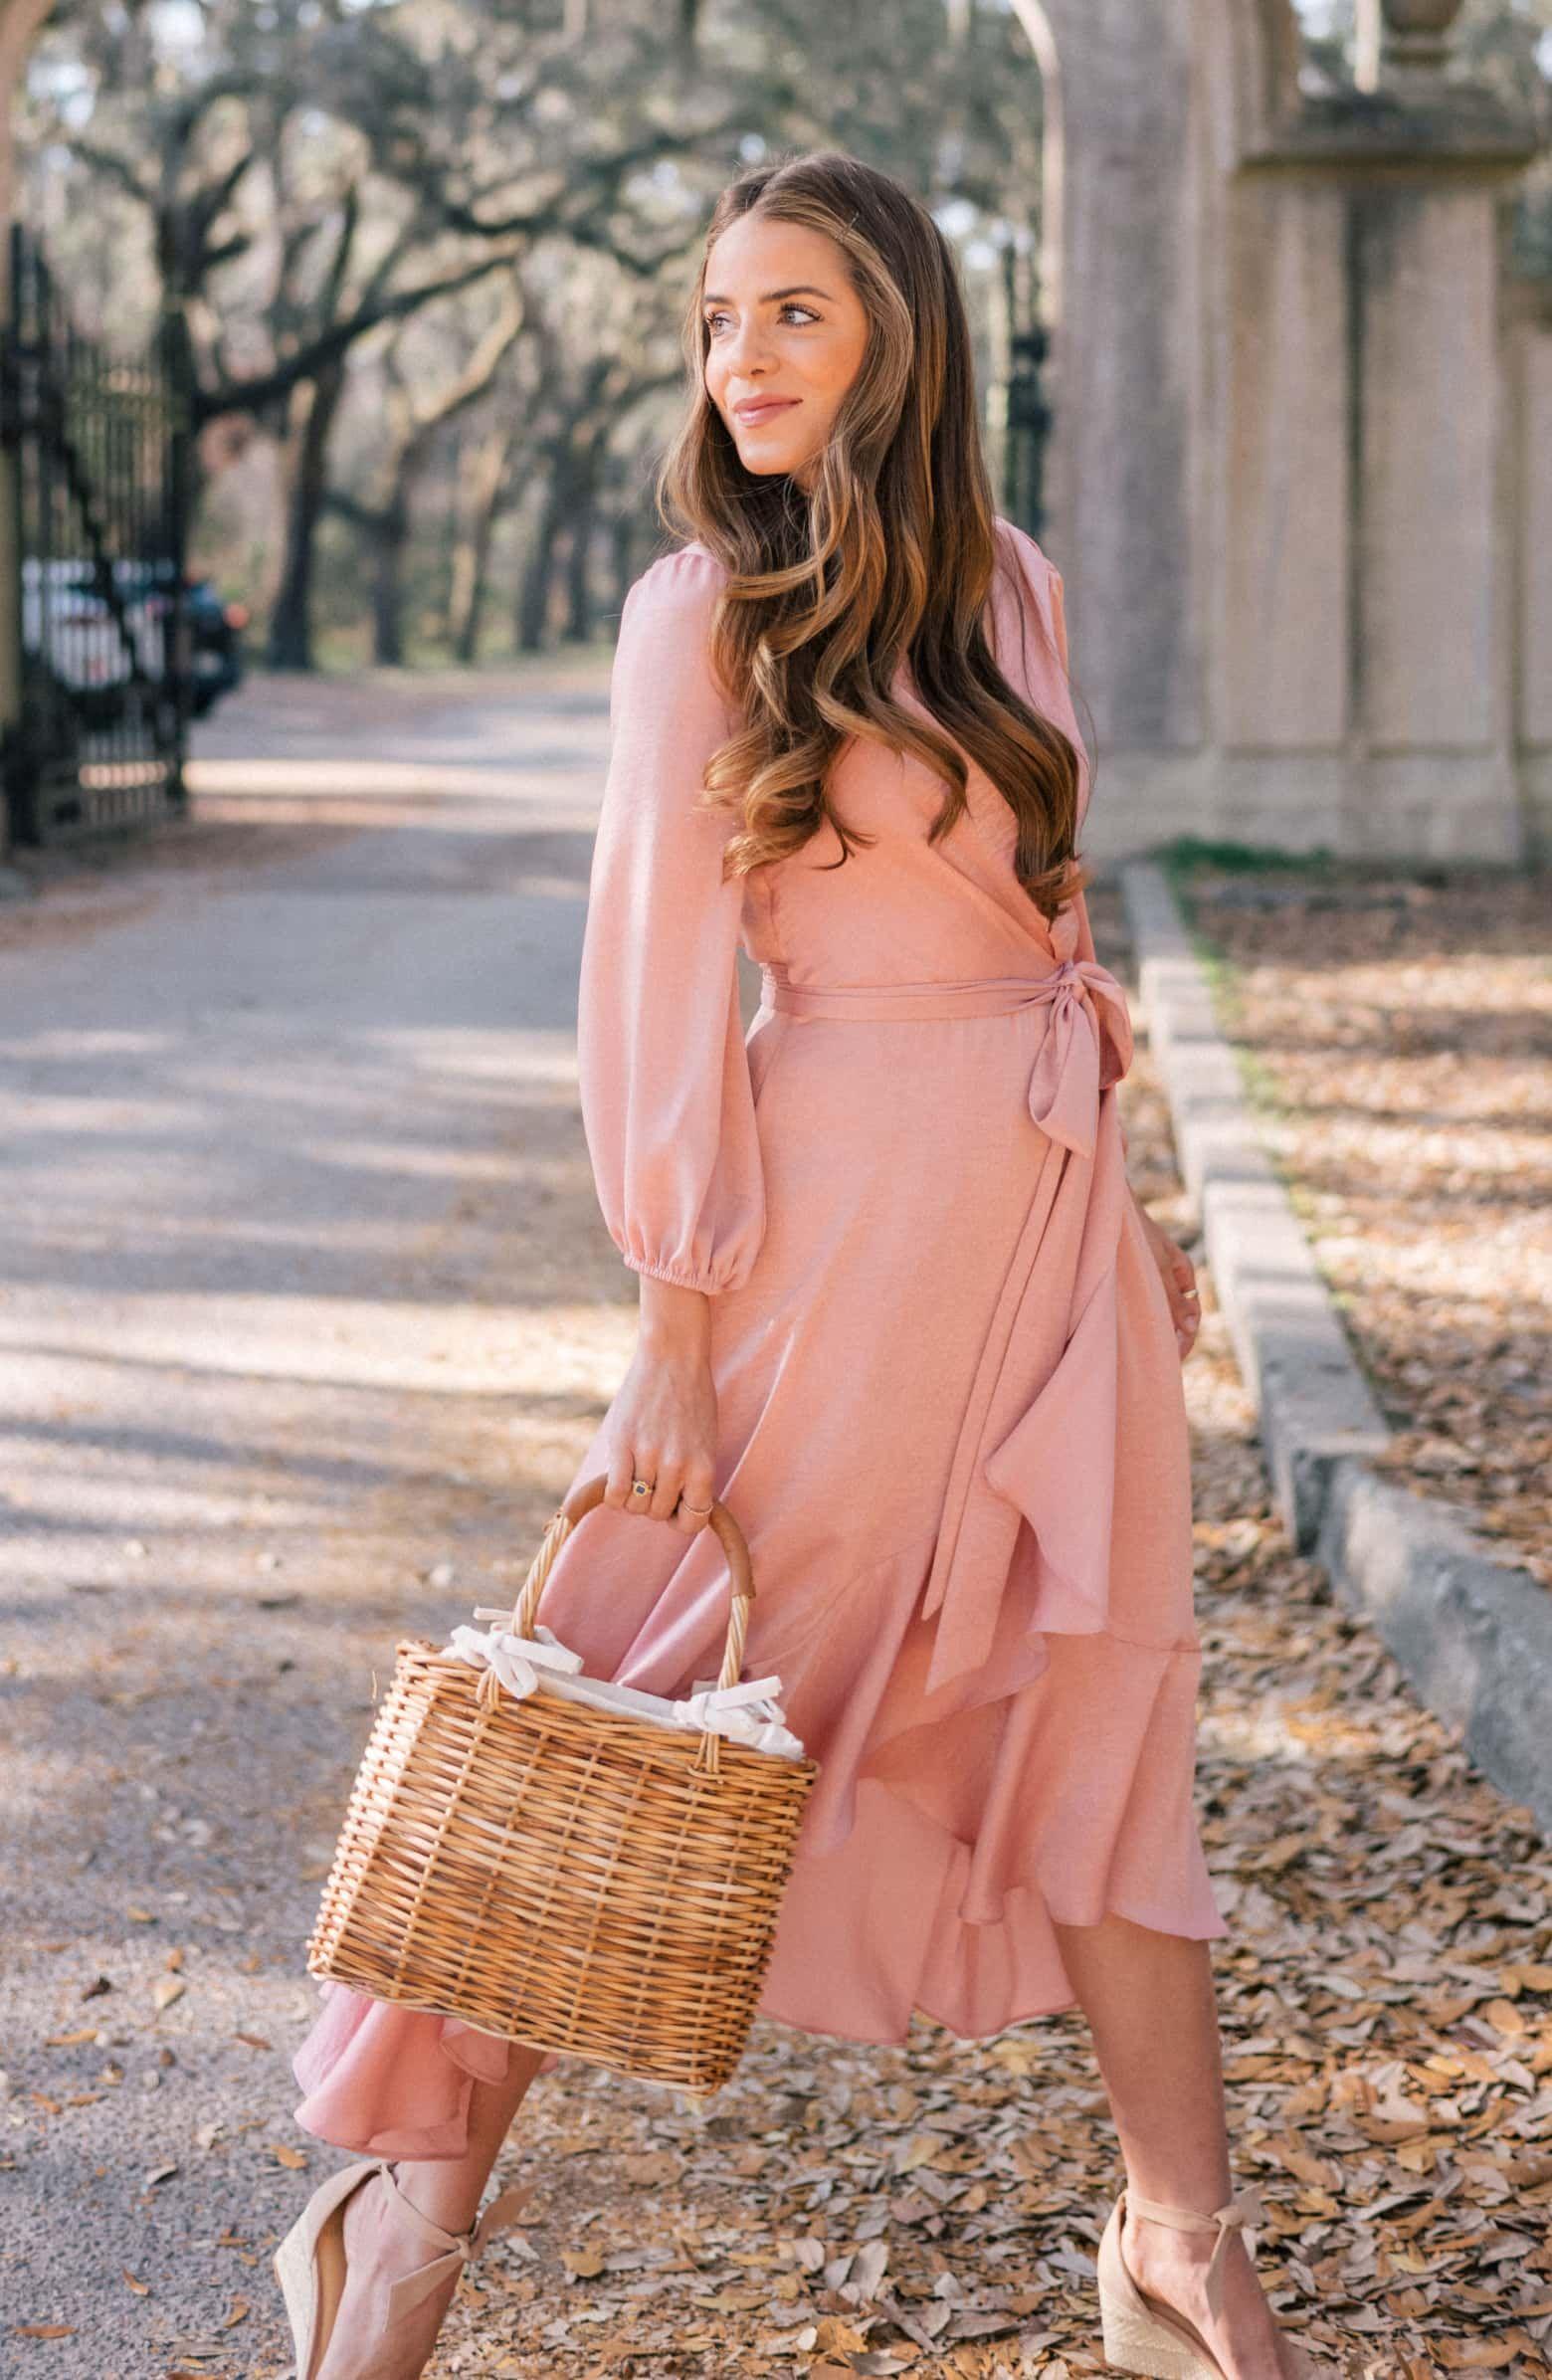 bd9a6ac9cc1b Gal Meets Glam Collection Jennifer Shimmer Satin Wrap Dress in Mauve |  Nordstrom #falldress #mididress #affiliate